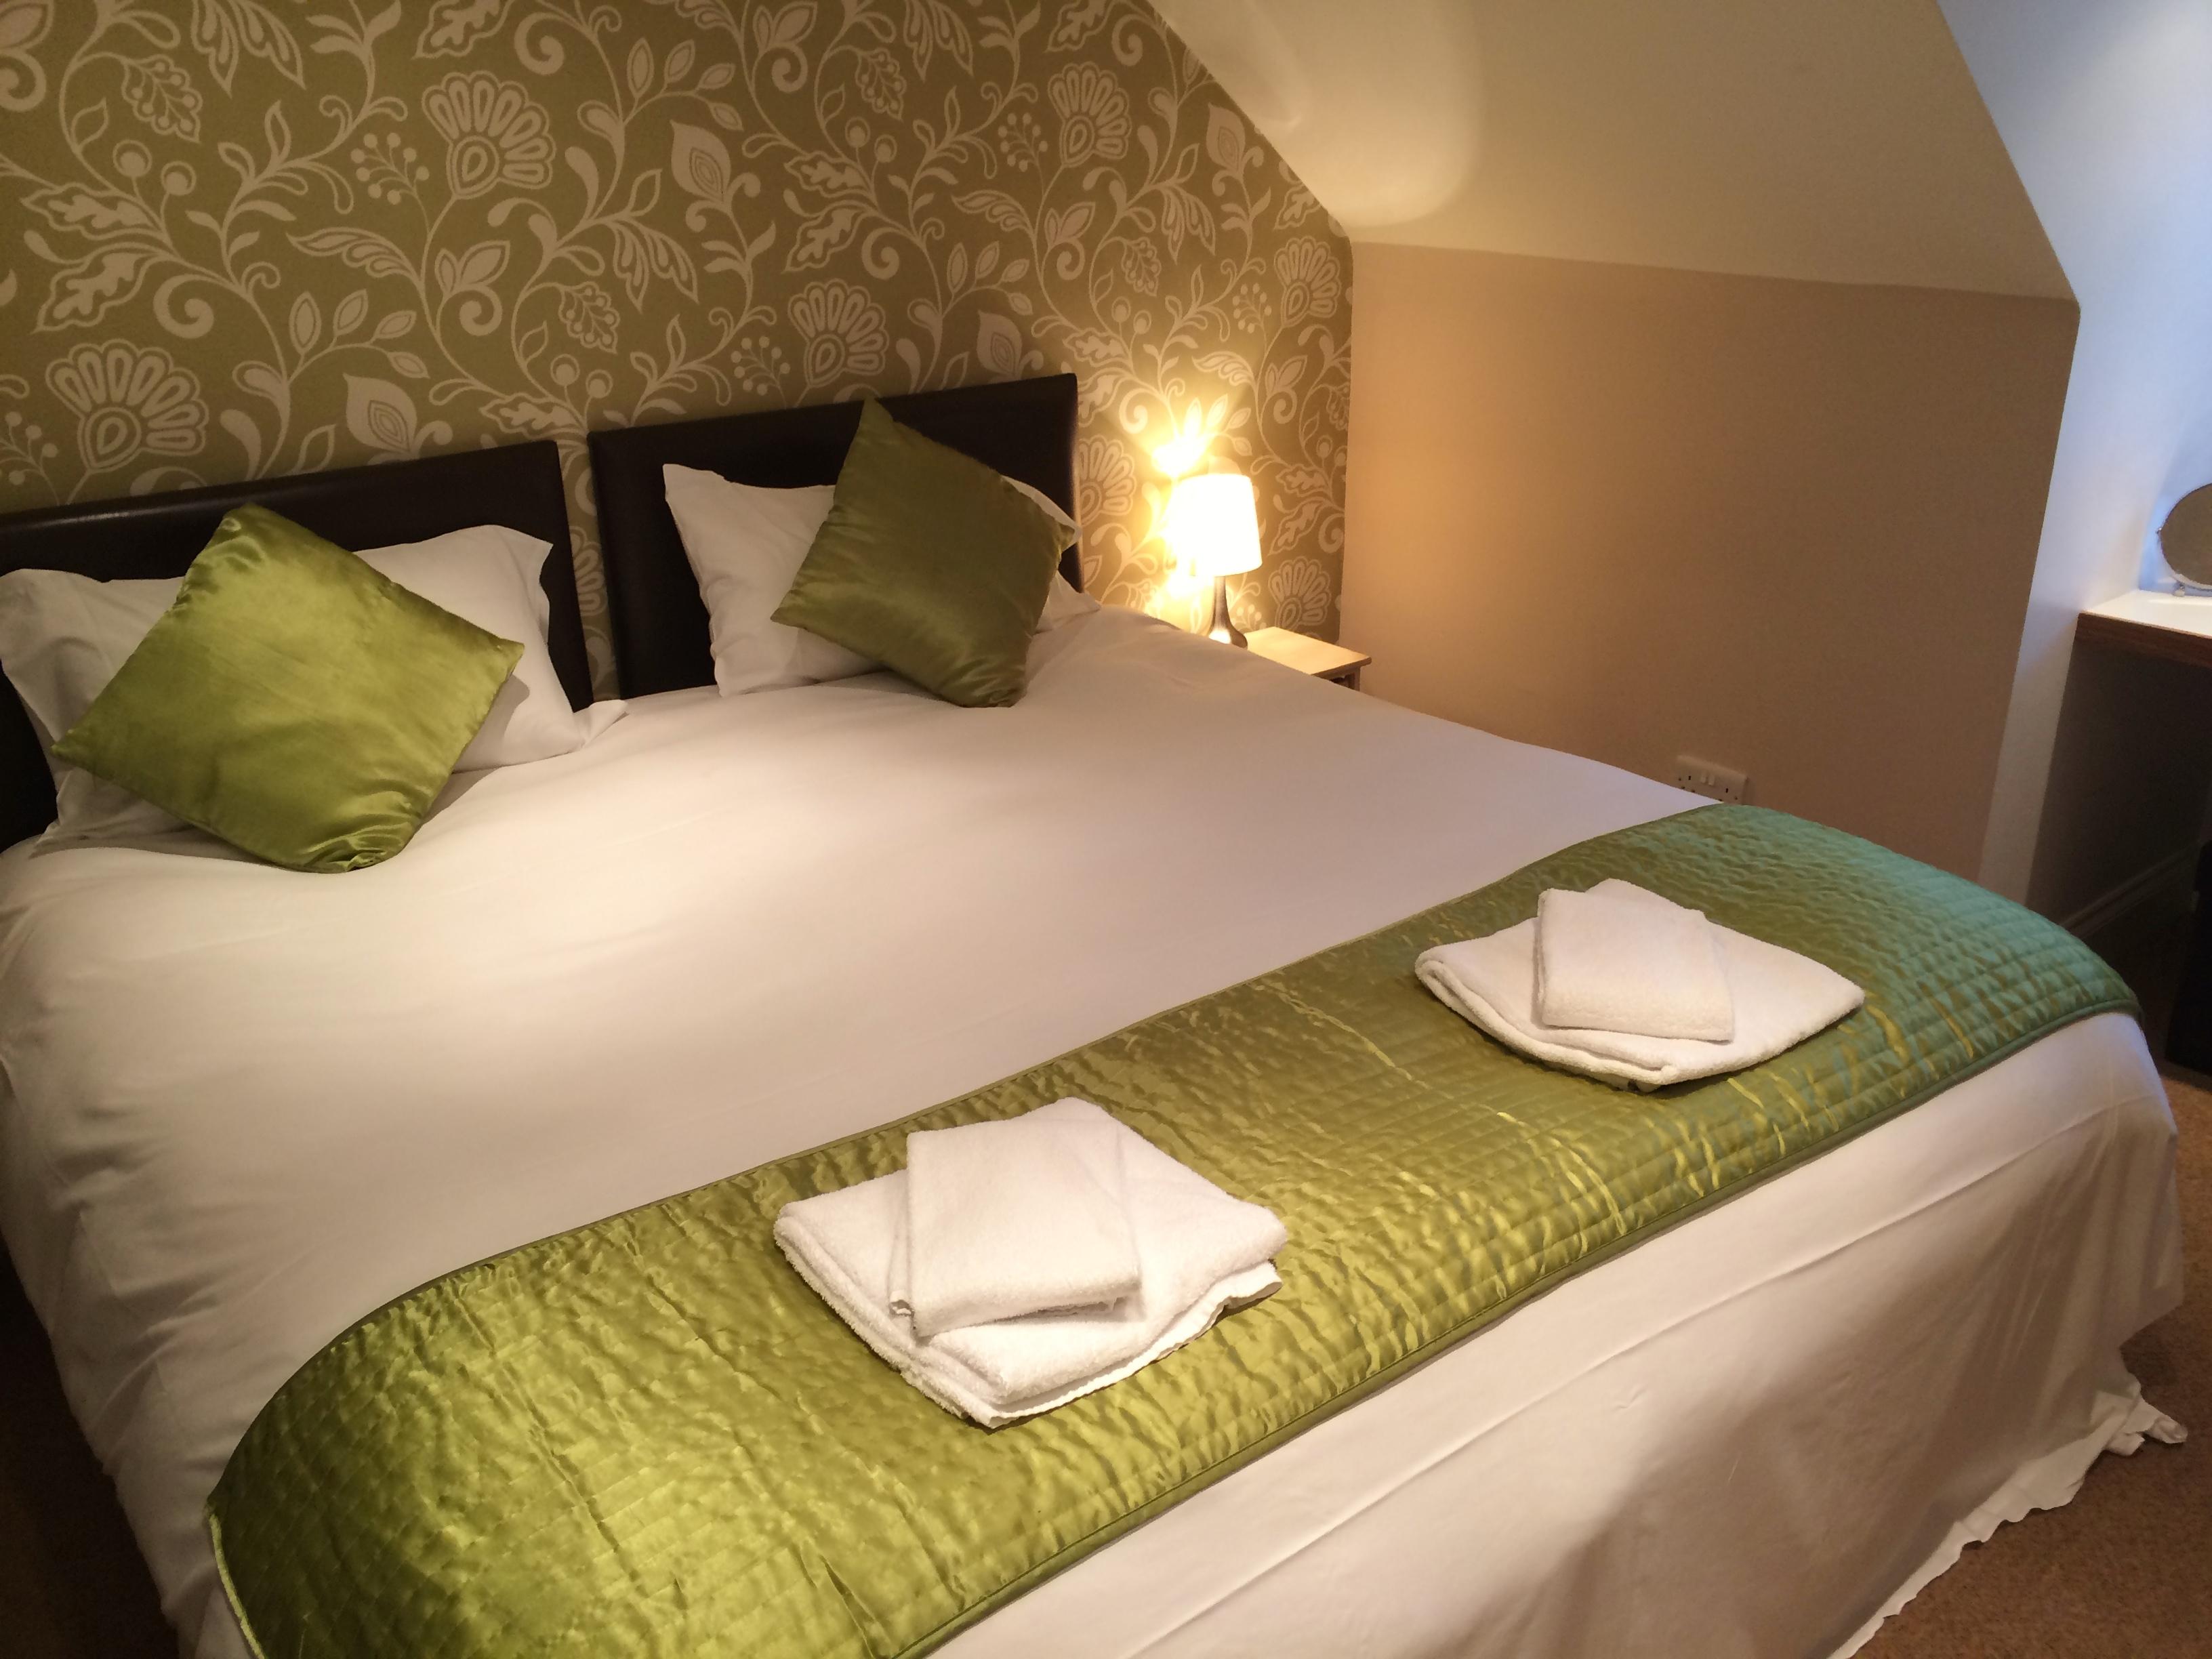 Accommodation at the House O Hill Inn Bargrennan, Newton Stewart